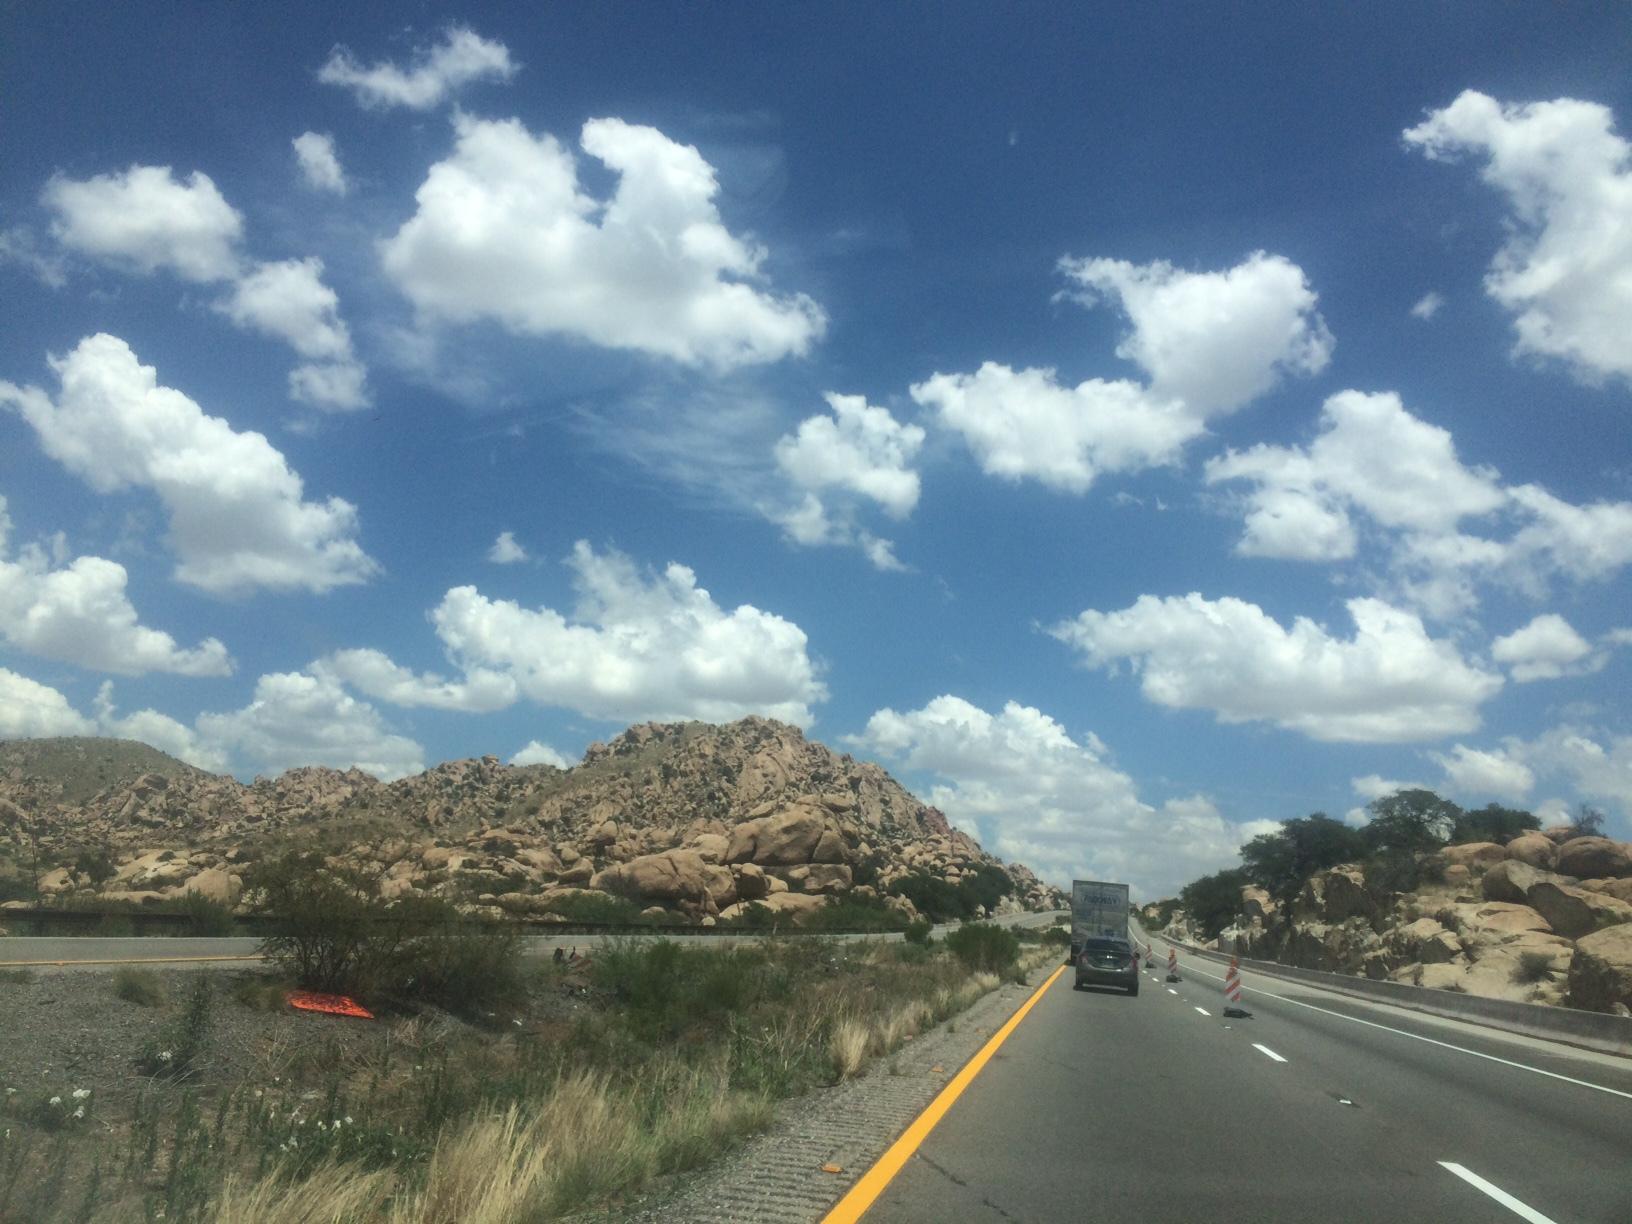 hastighet dating New Mexico